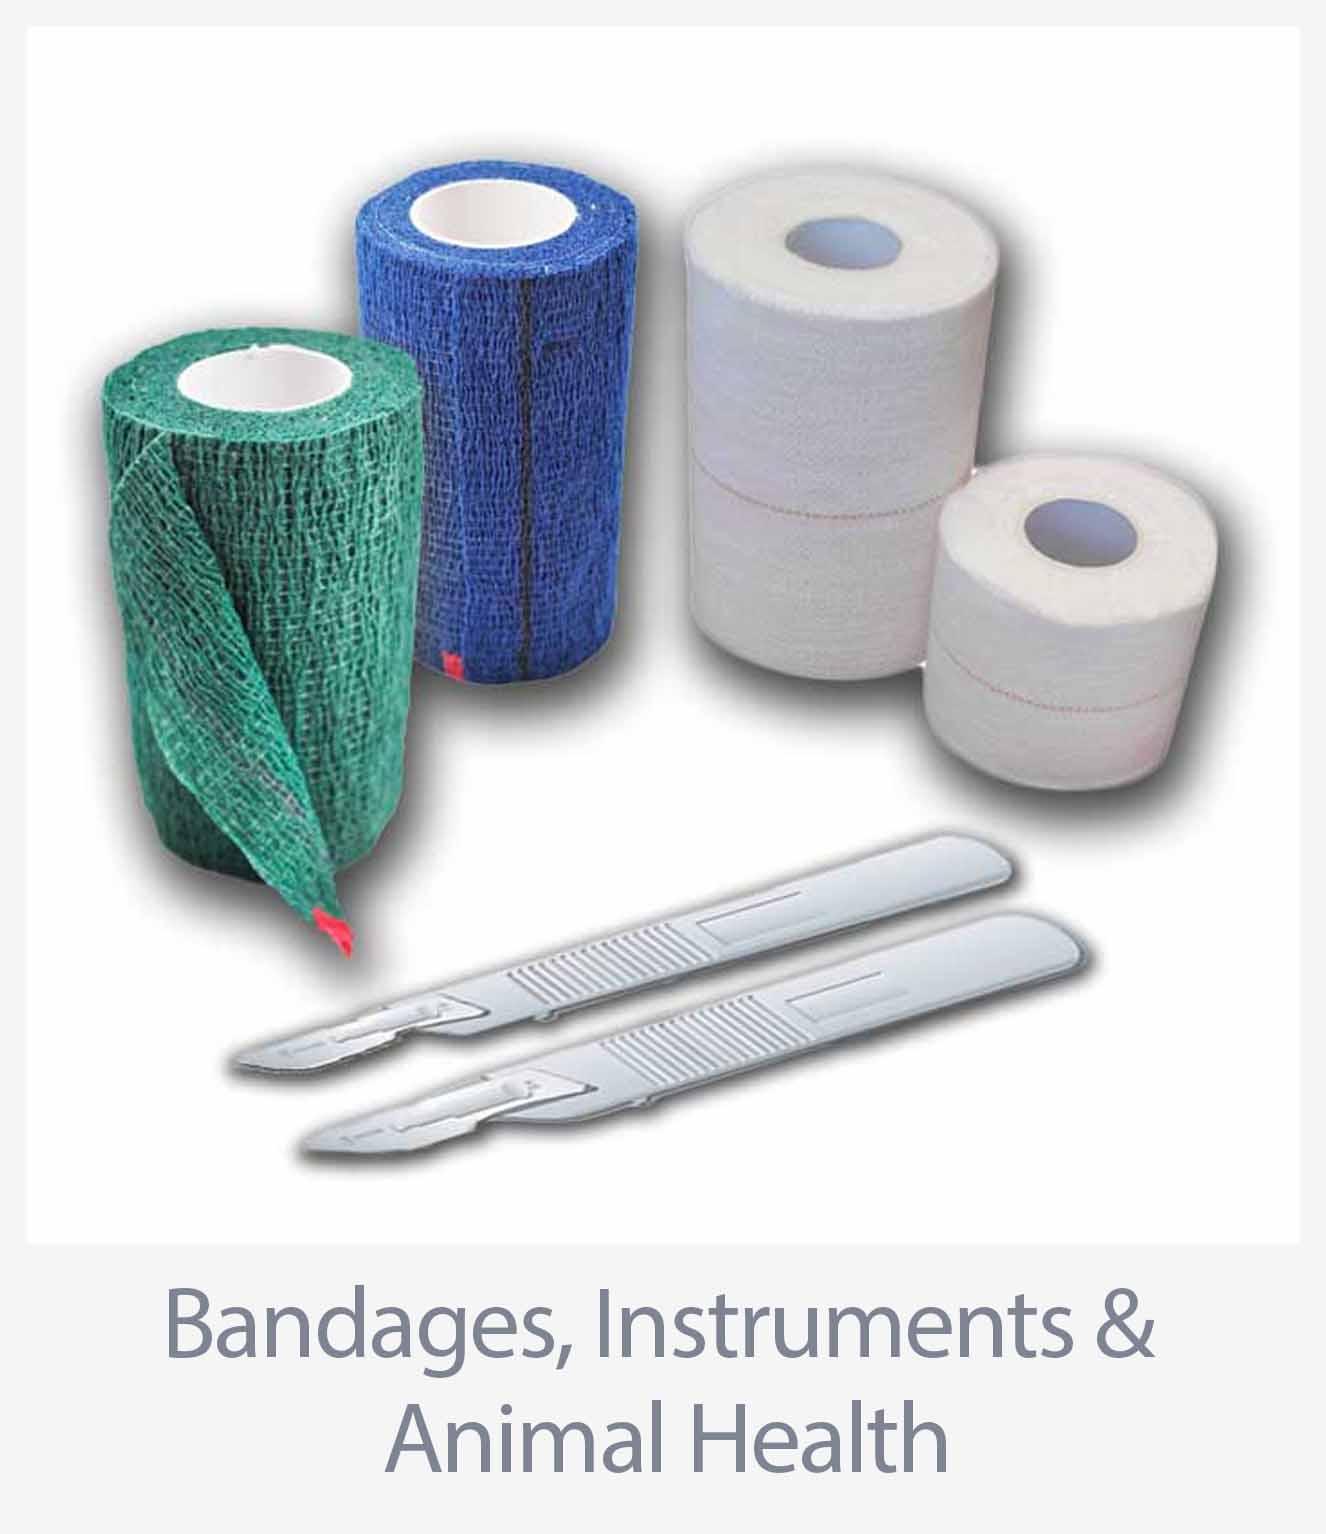 Bandages, Instruments & Animal Health